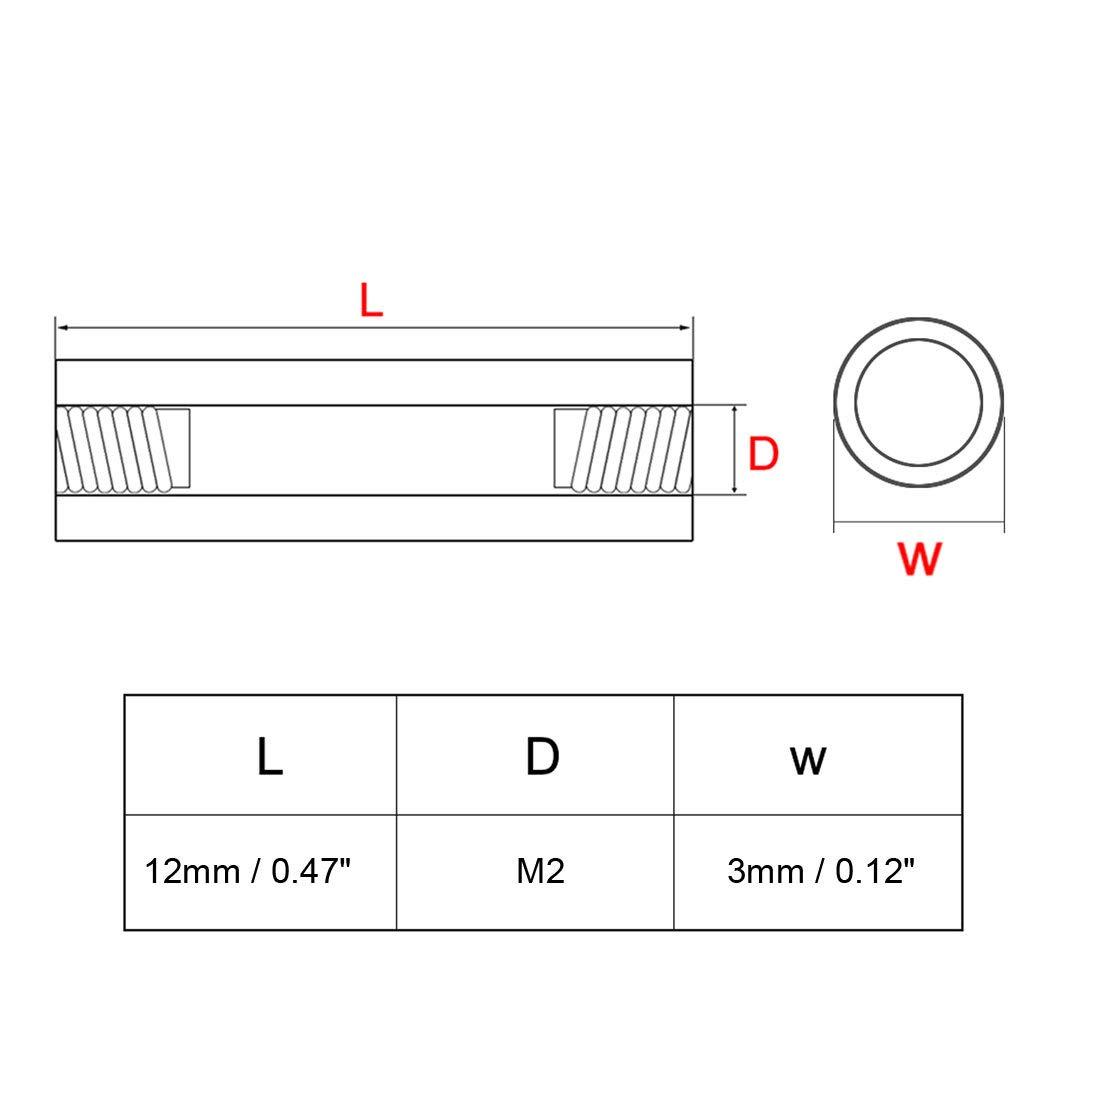 uxcell 50pcs Brass Round Straight PCB Pillar Female Thread Standoff Spacer M2x3x21mm